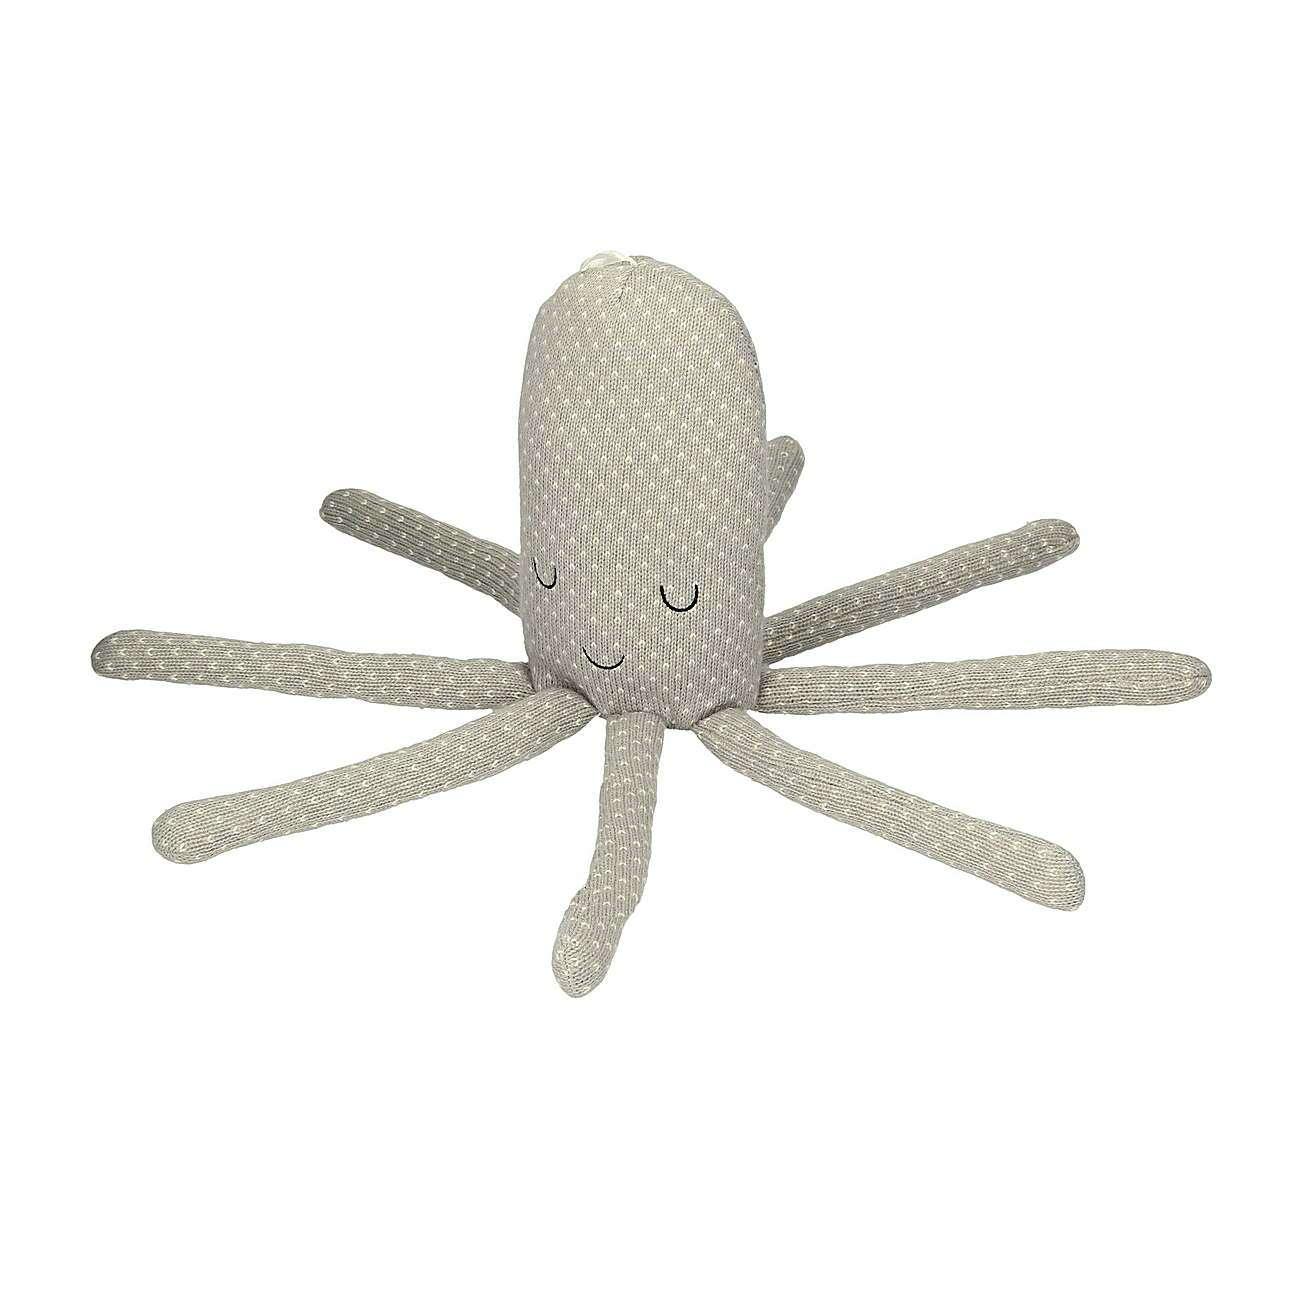 Octopus cuddle pillow